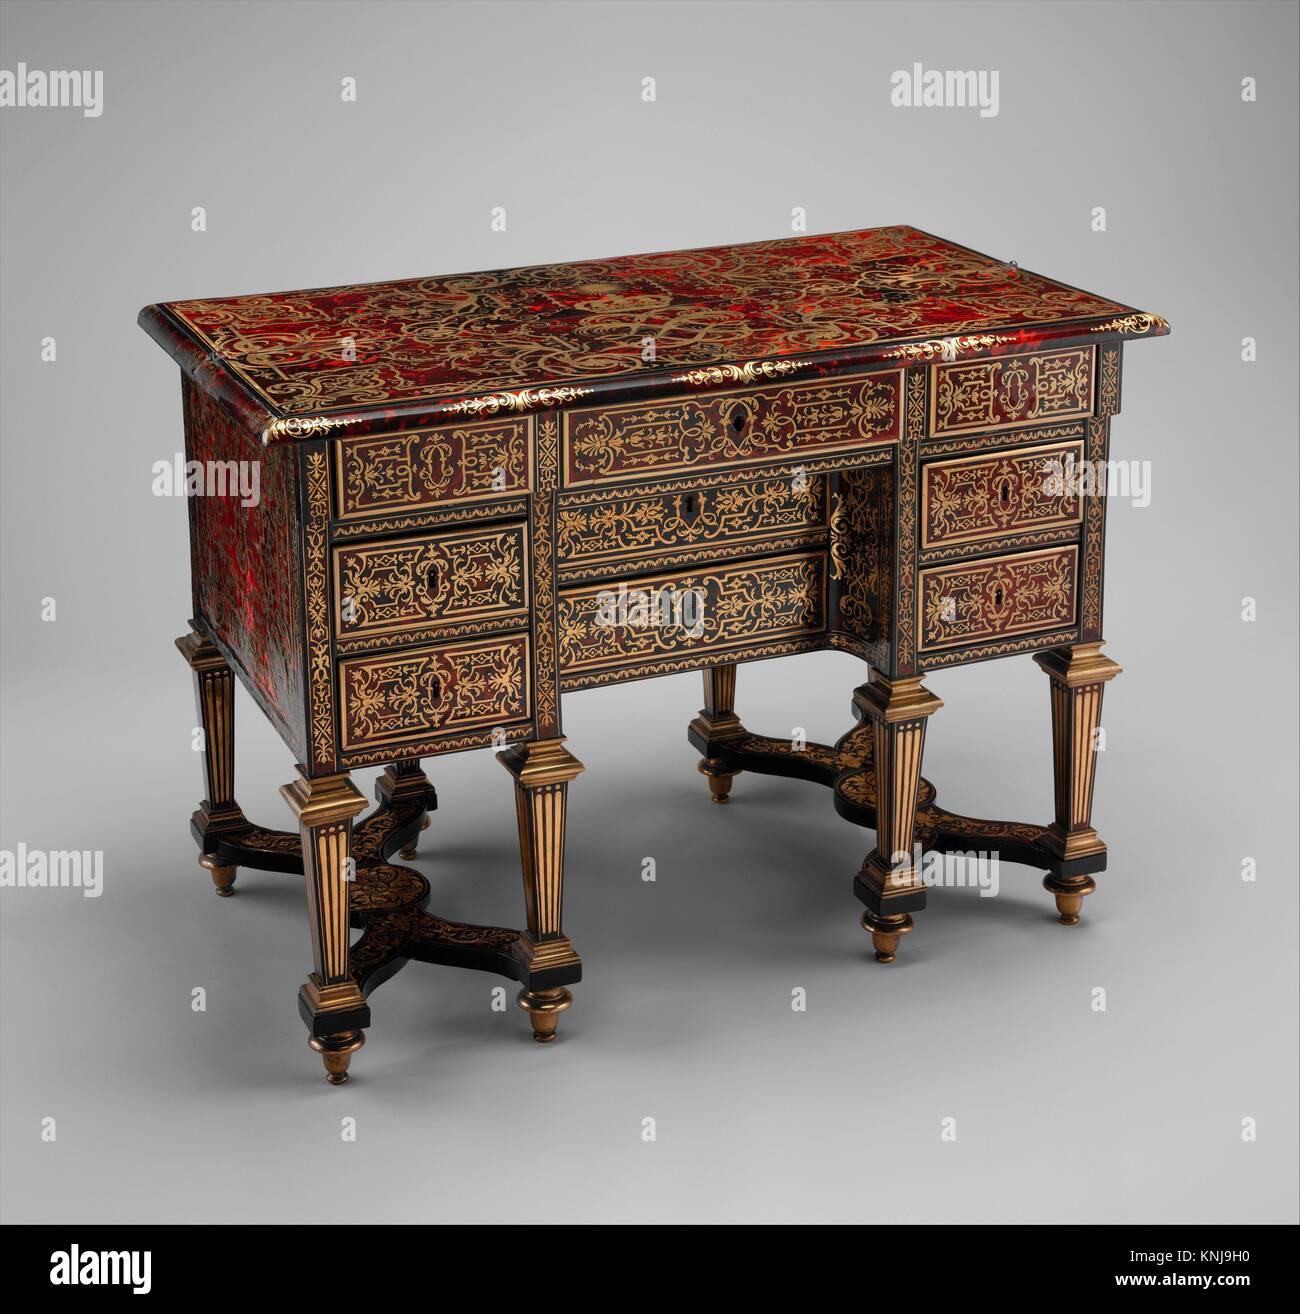 Small desk with folding top (bureau brisé). Maker: Marquetry by Alexandre-Jean Oppenordt (Dutch, 1639-1715, - Stock Image